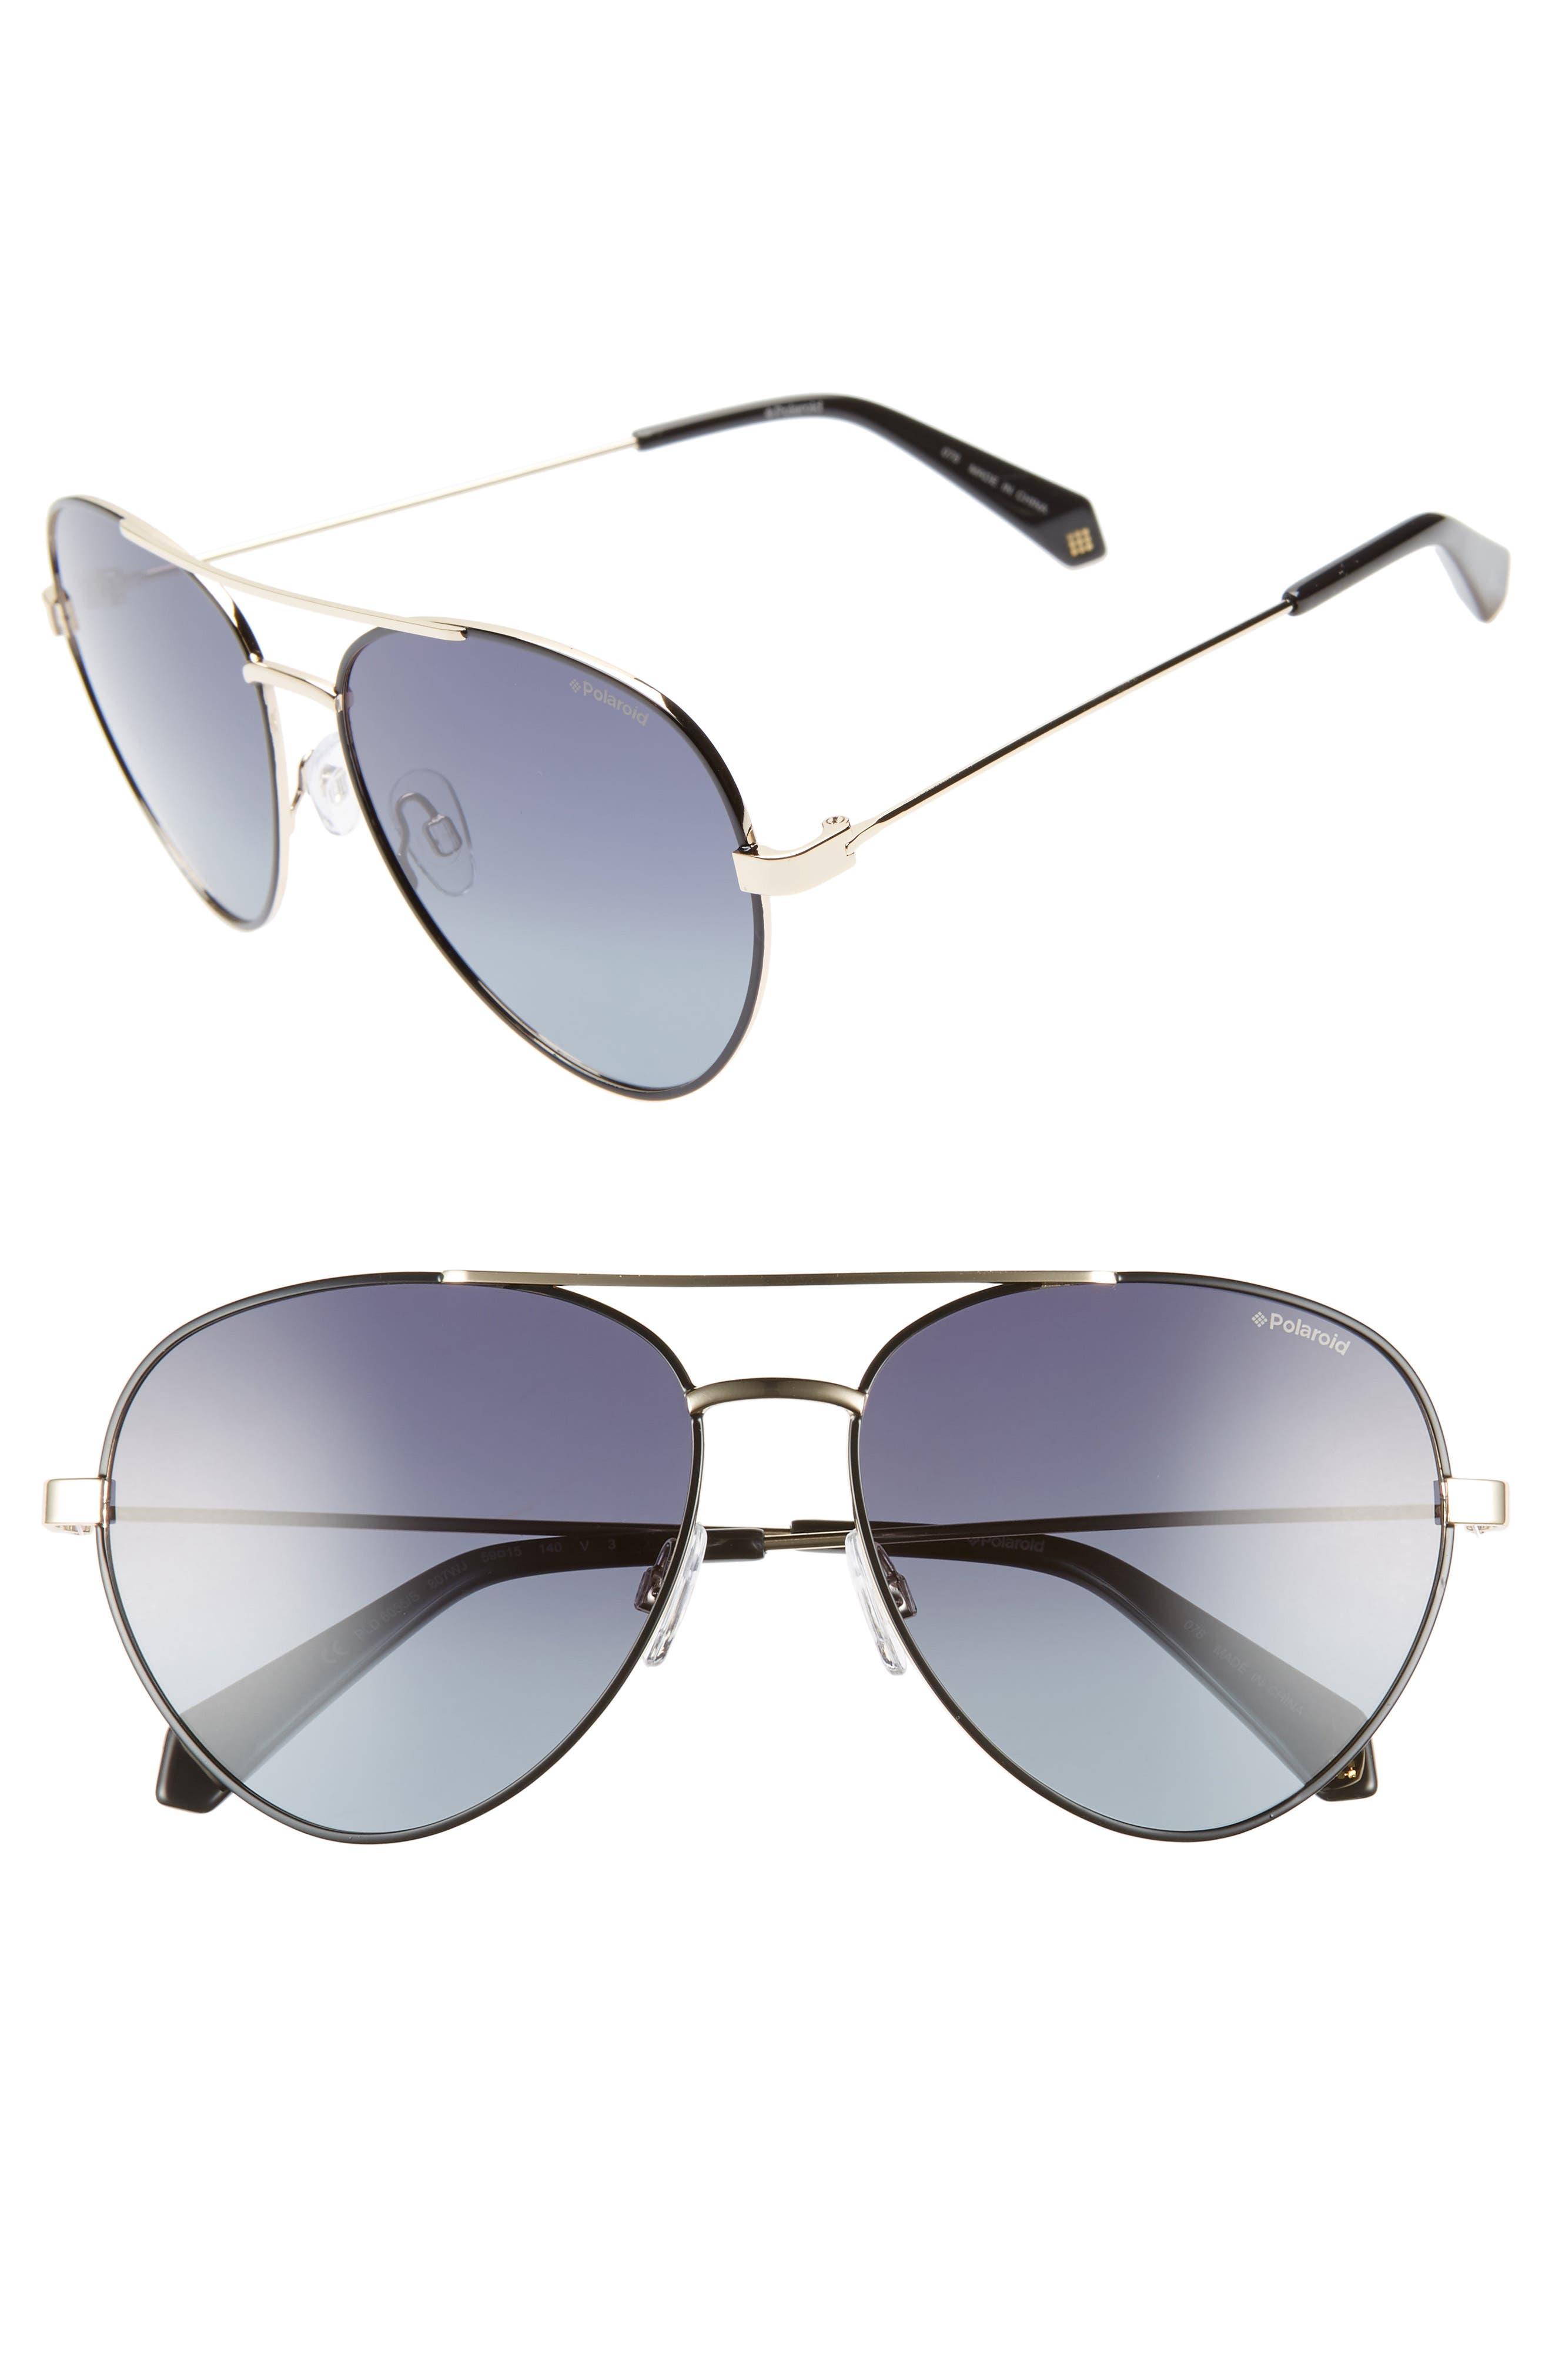 POLAROID 59Mm Polarized Aviator Sunglasses - Black